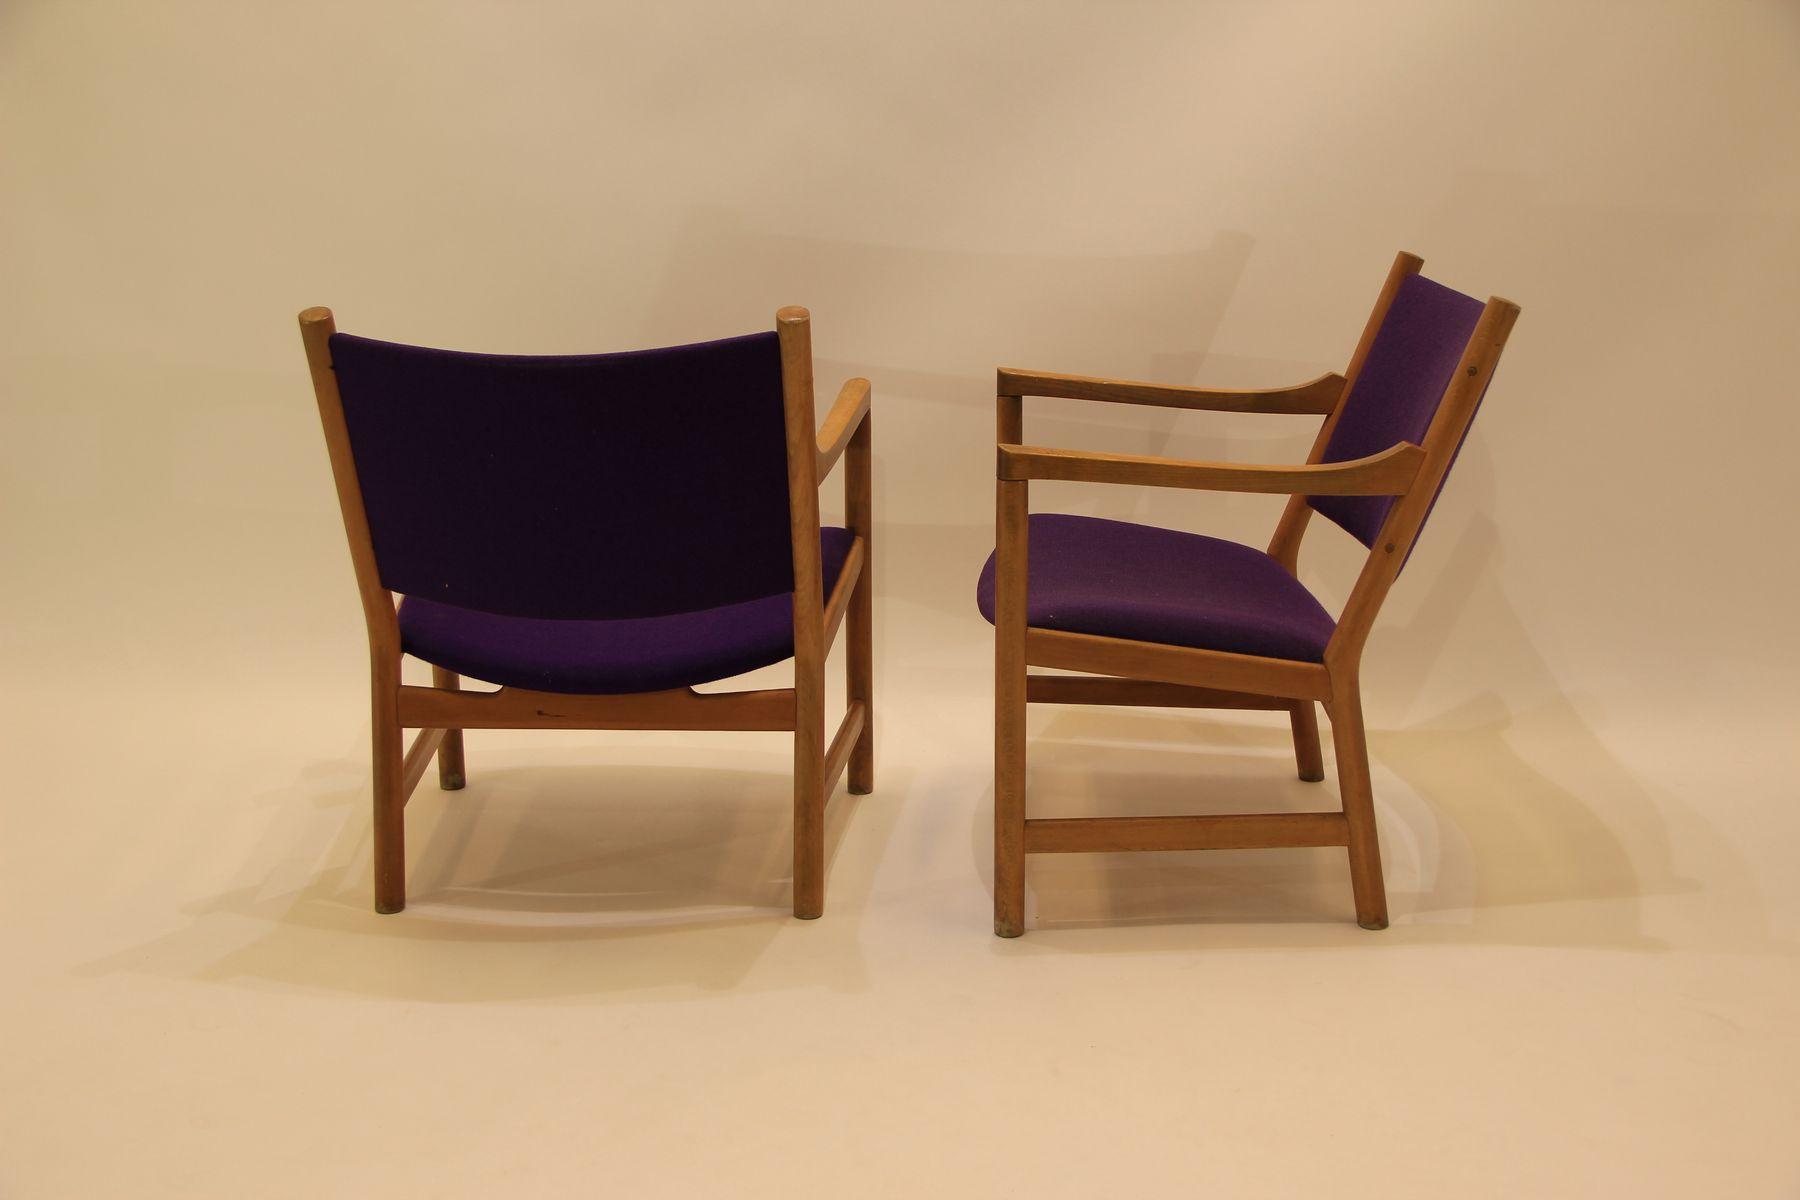 vintage ch52 armchairs by hans j wegner for carl hansen. Black Bedroom Furniture Sets. Home Design Ideas